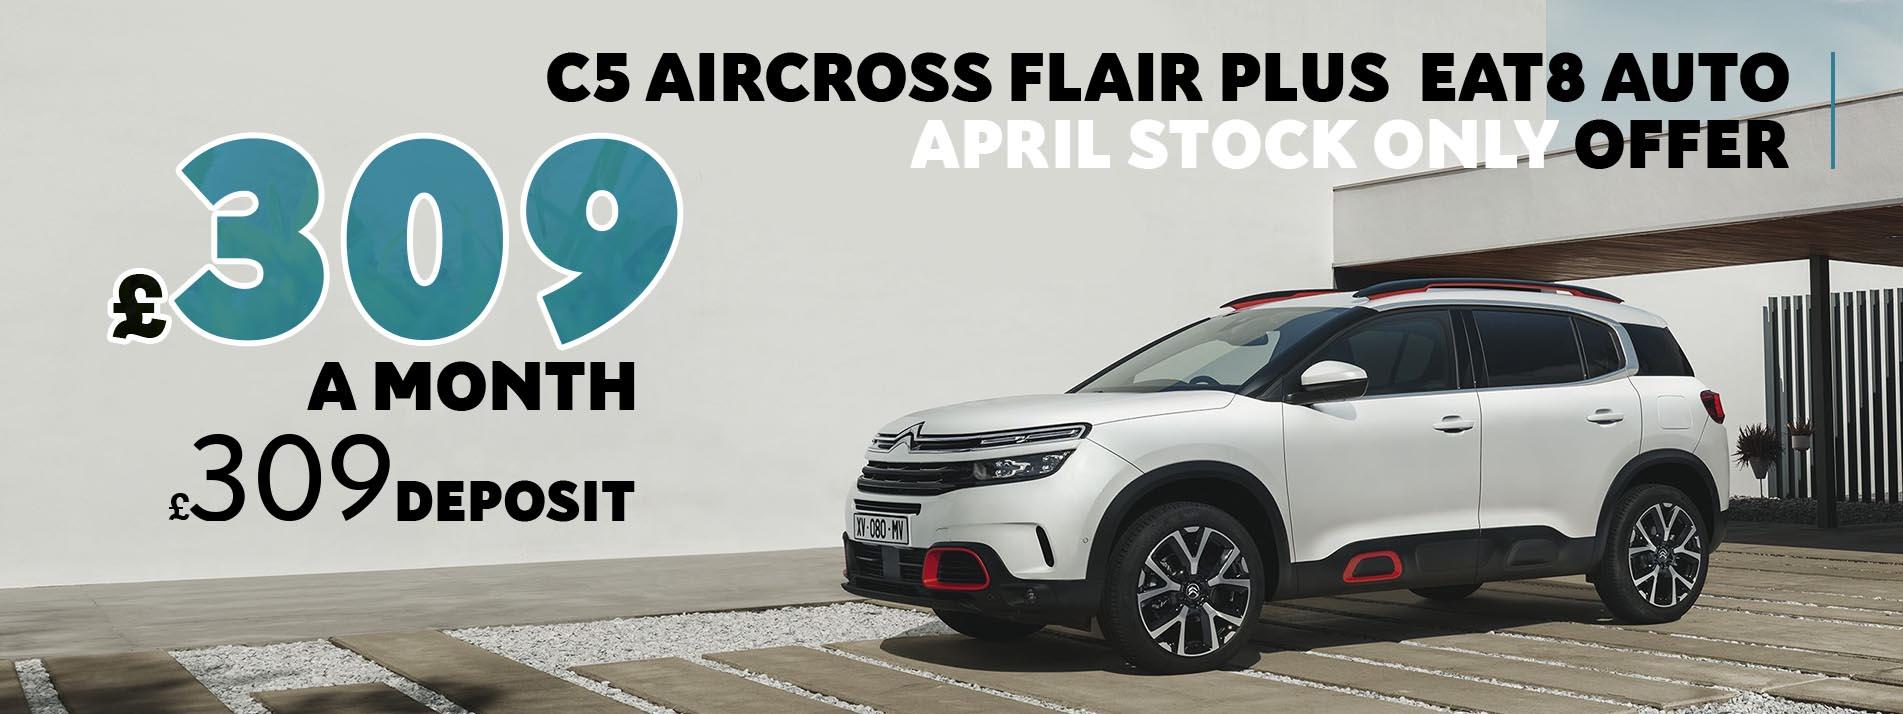 citroen-c5-aircross-flair-plus-april-stock-offer-m-sli